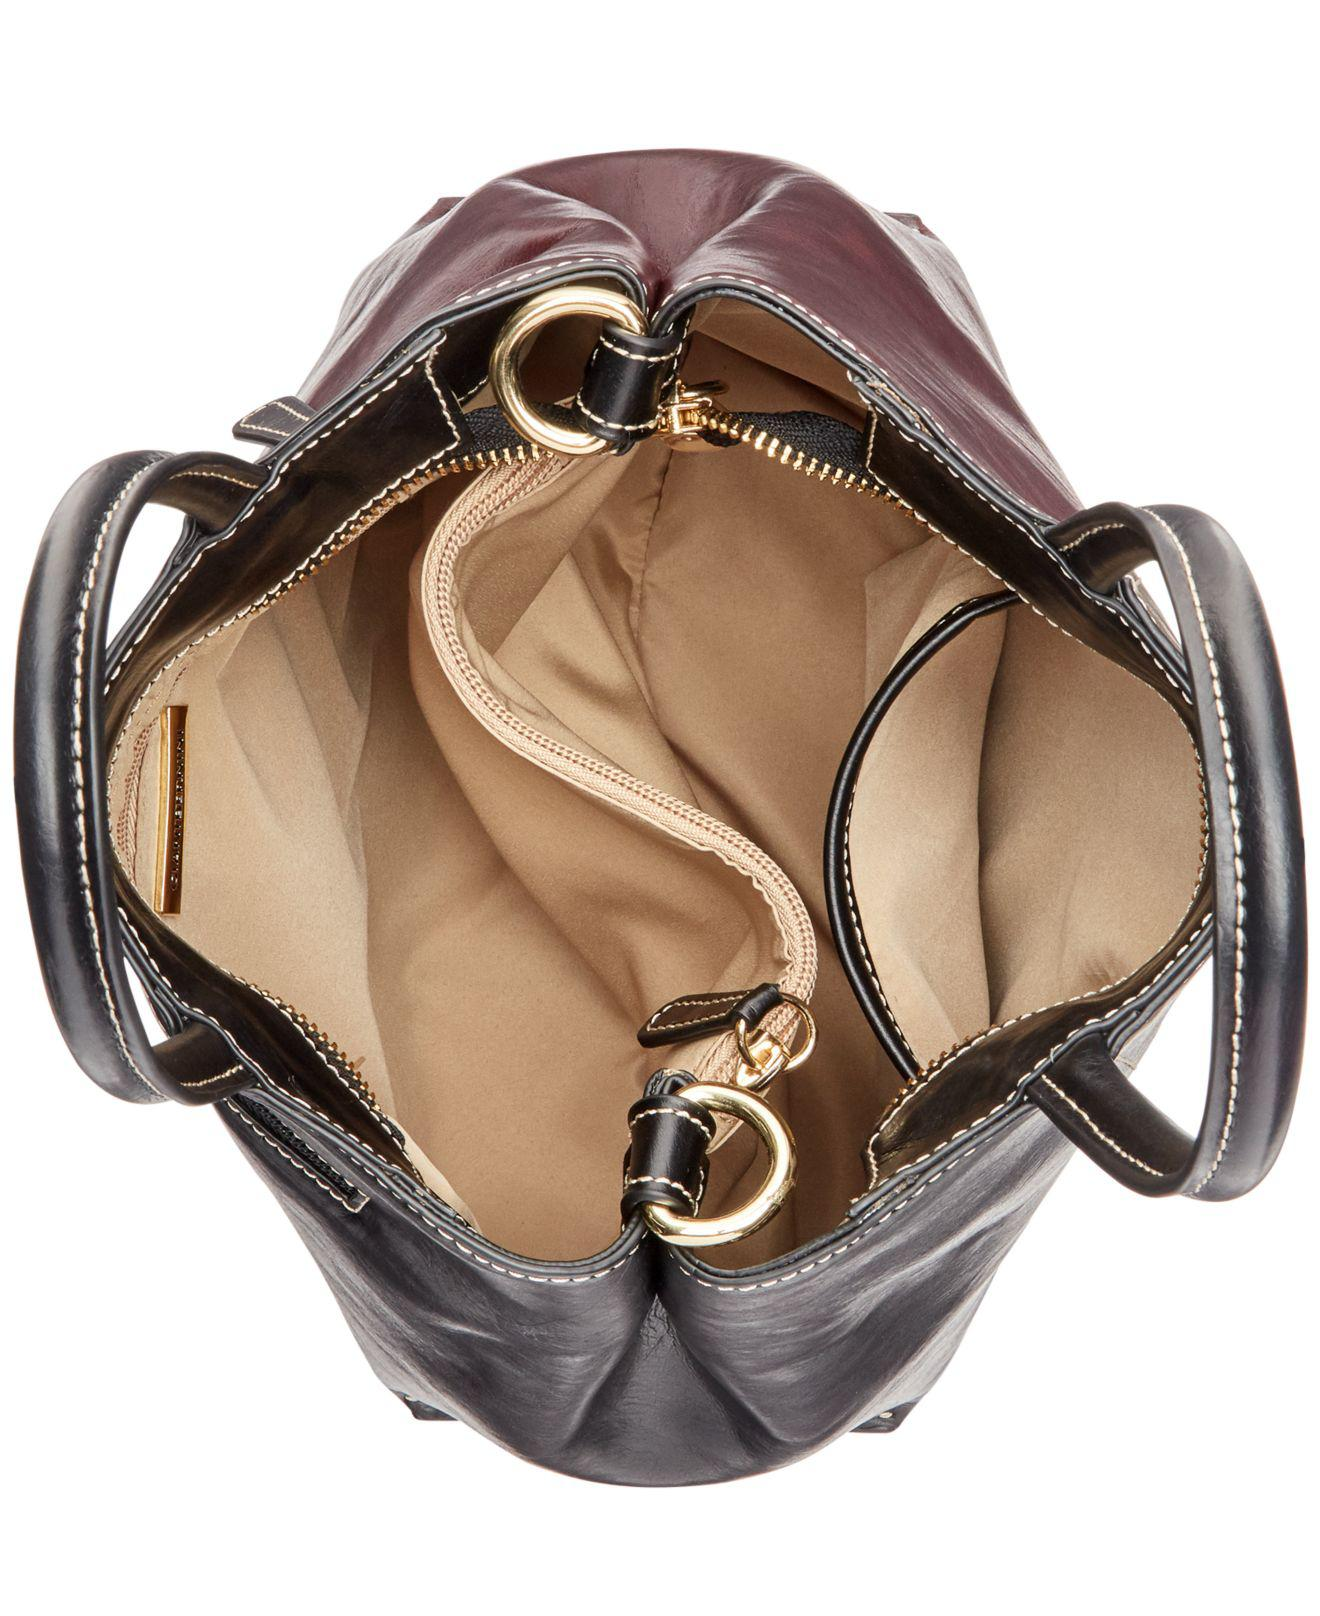 Lyst - Giani Bernini Tricolor Glazed Bucket Bag